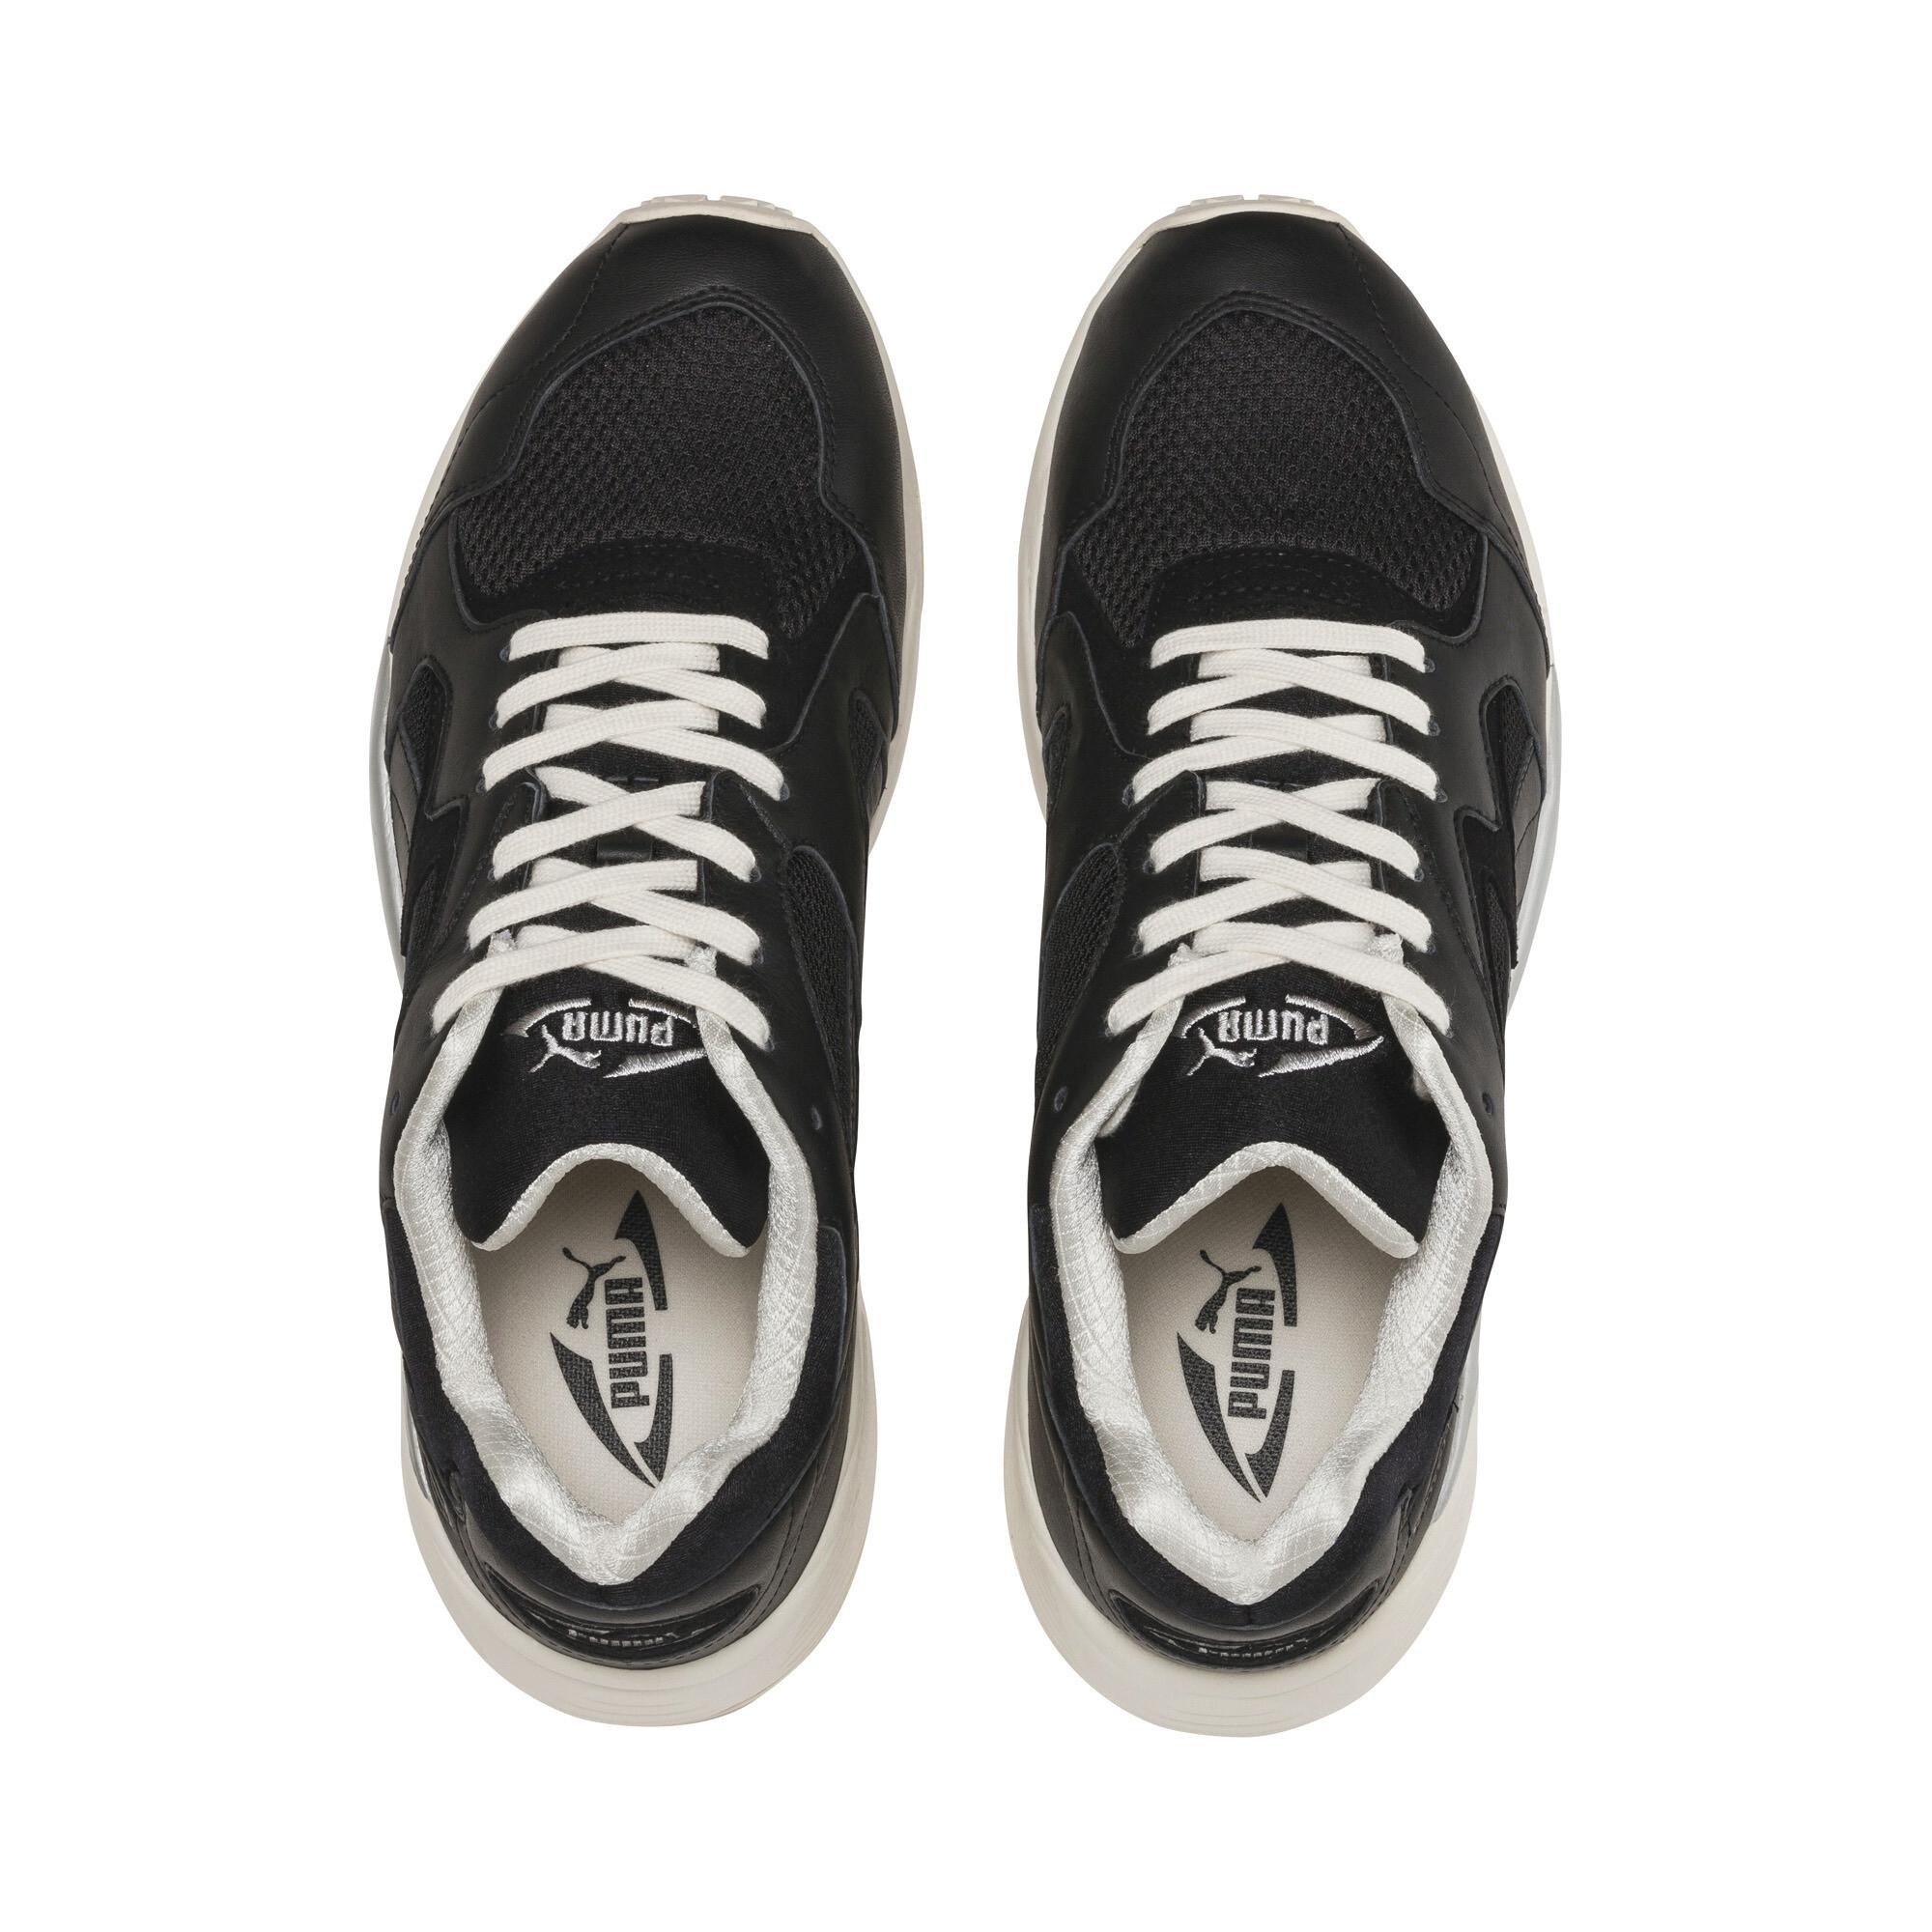 PUMA-Prevail-IR-Reality-Sneakers-Unisex-Shoe thumbnail 13